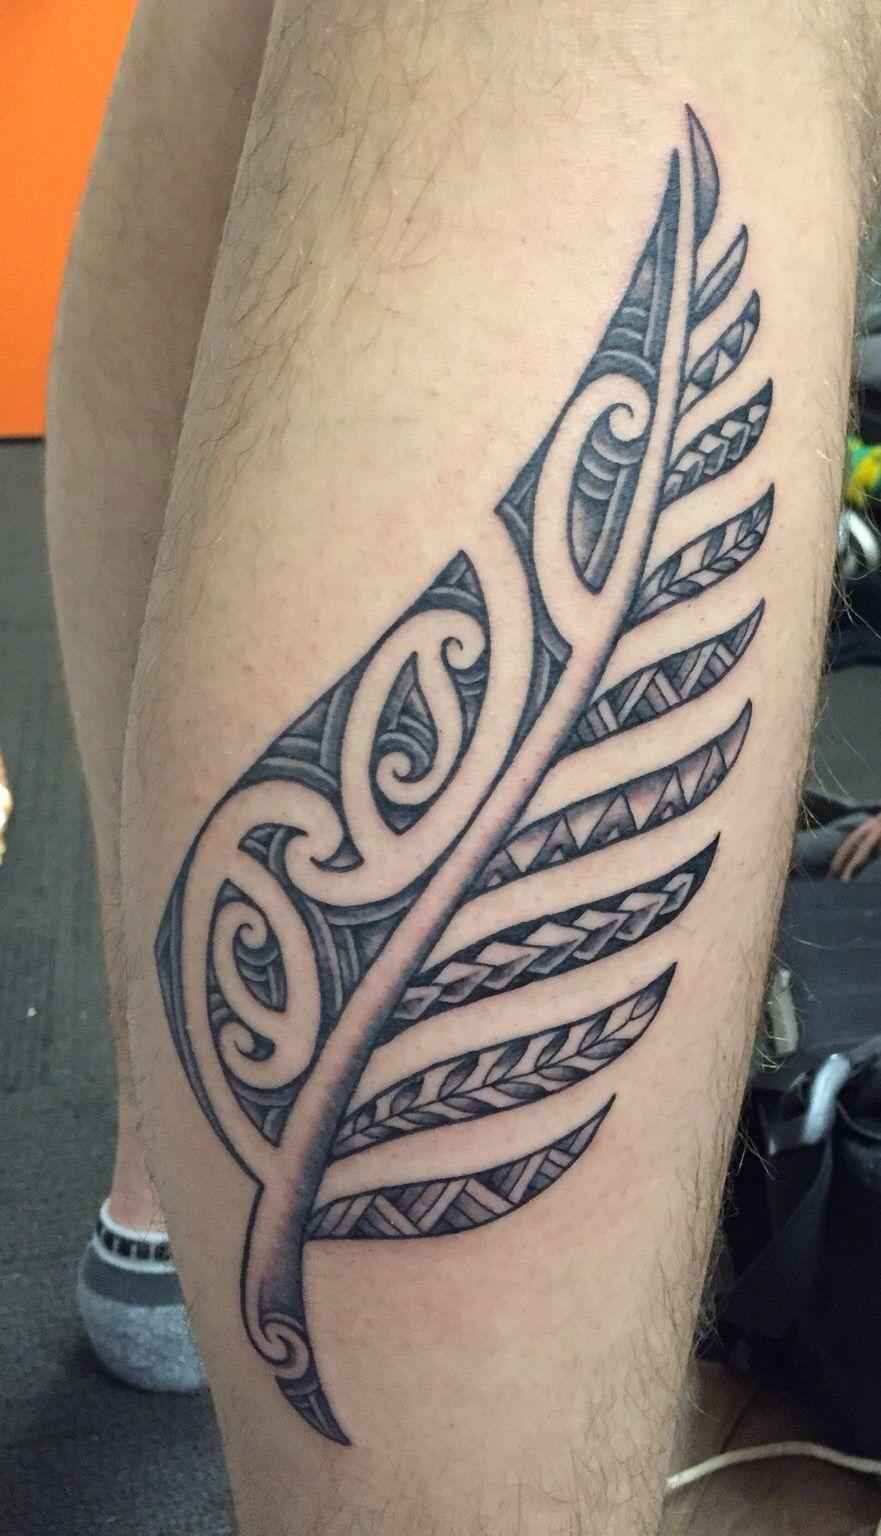 maori inspired silver fern tattoos pinterest maori fern and tattoo. Black Bedroom Furniture Sets. Home Design Ideas